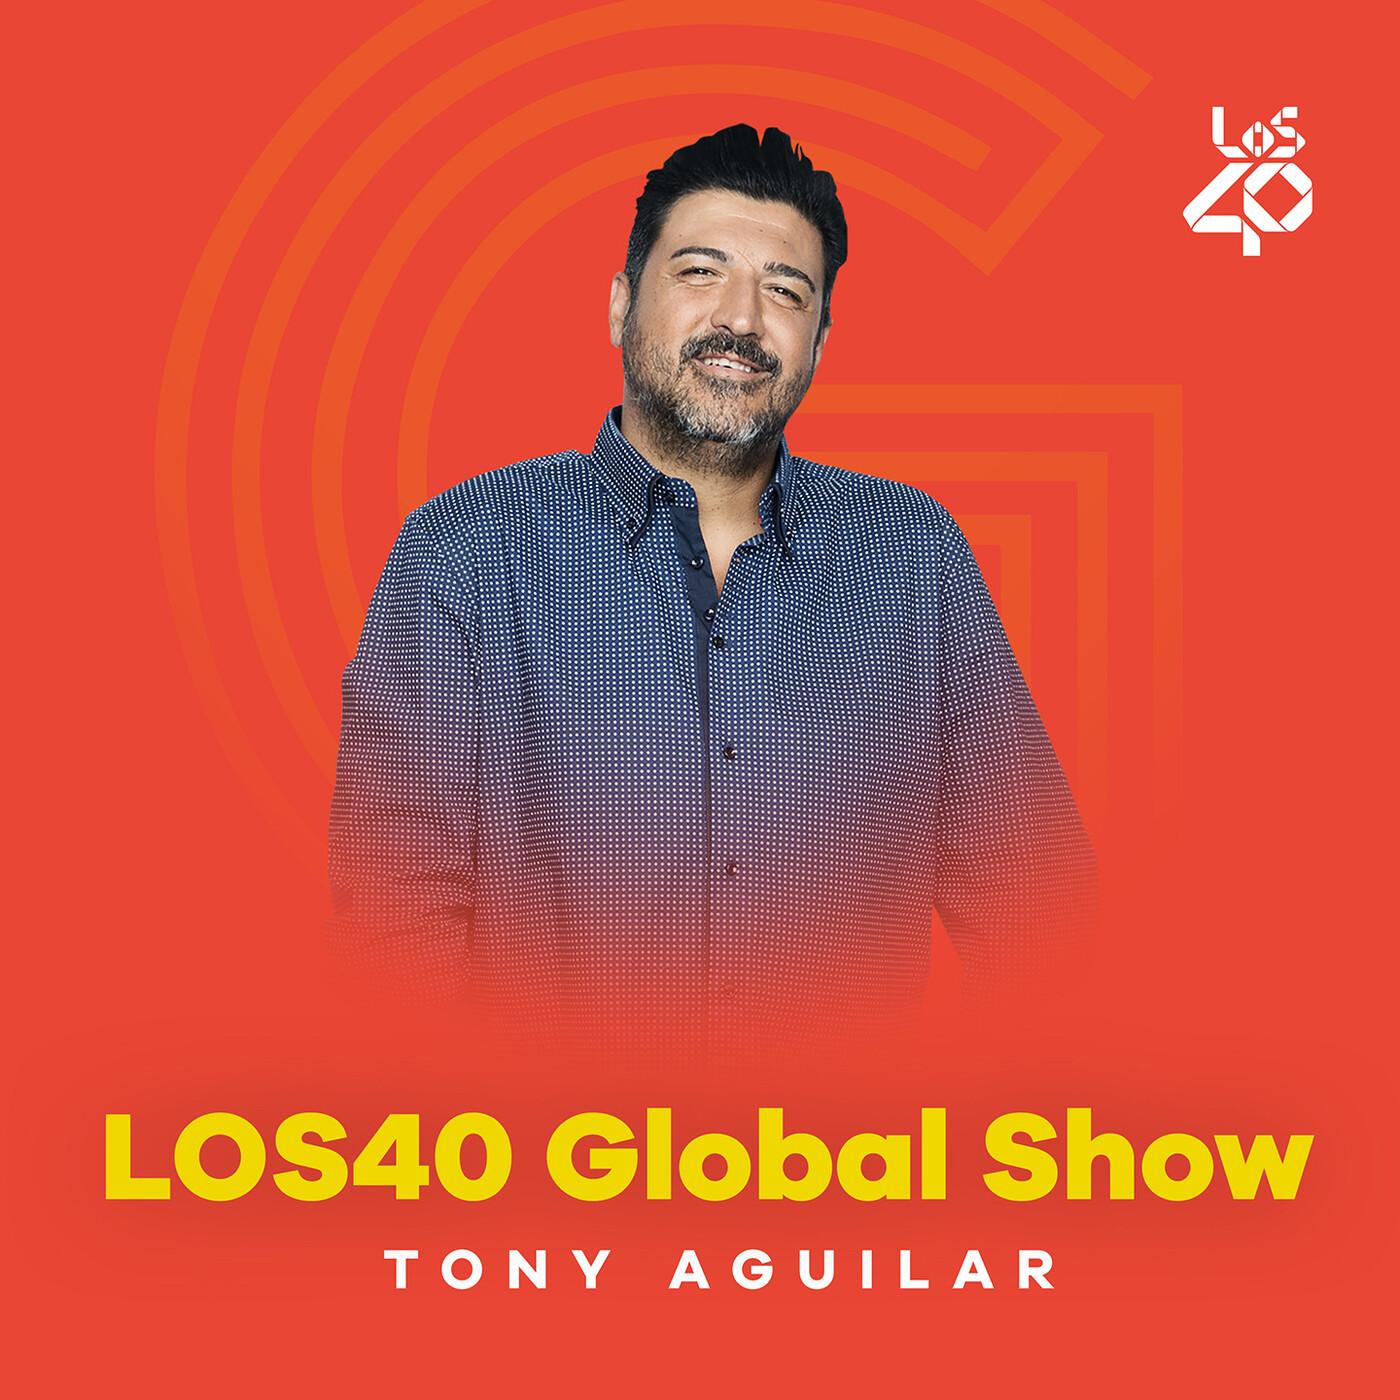 LOS40 Global Show, 20-21h - 27/09/2020